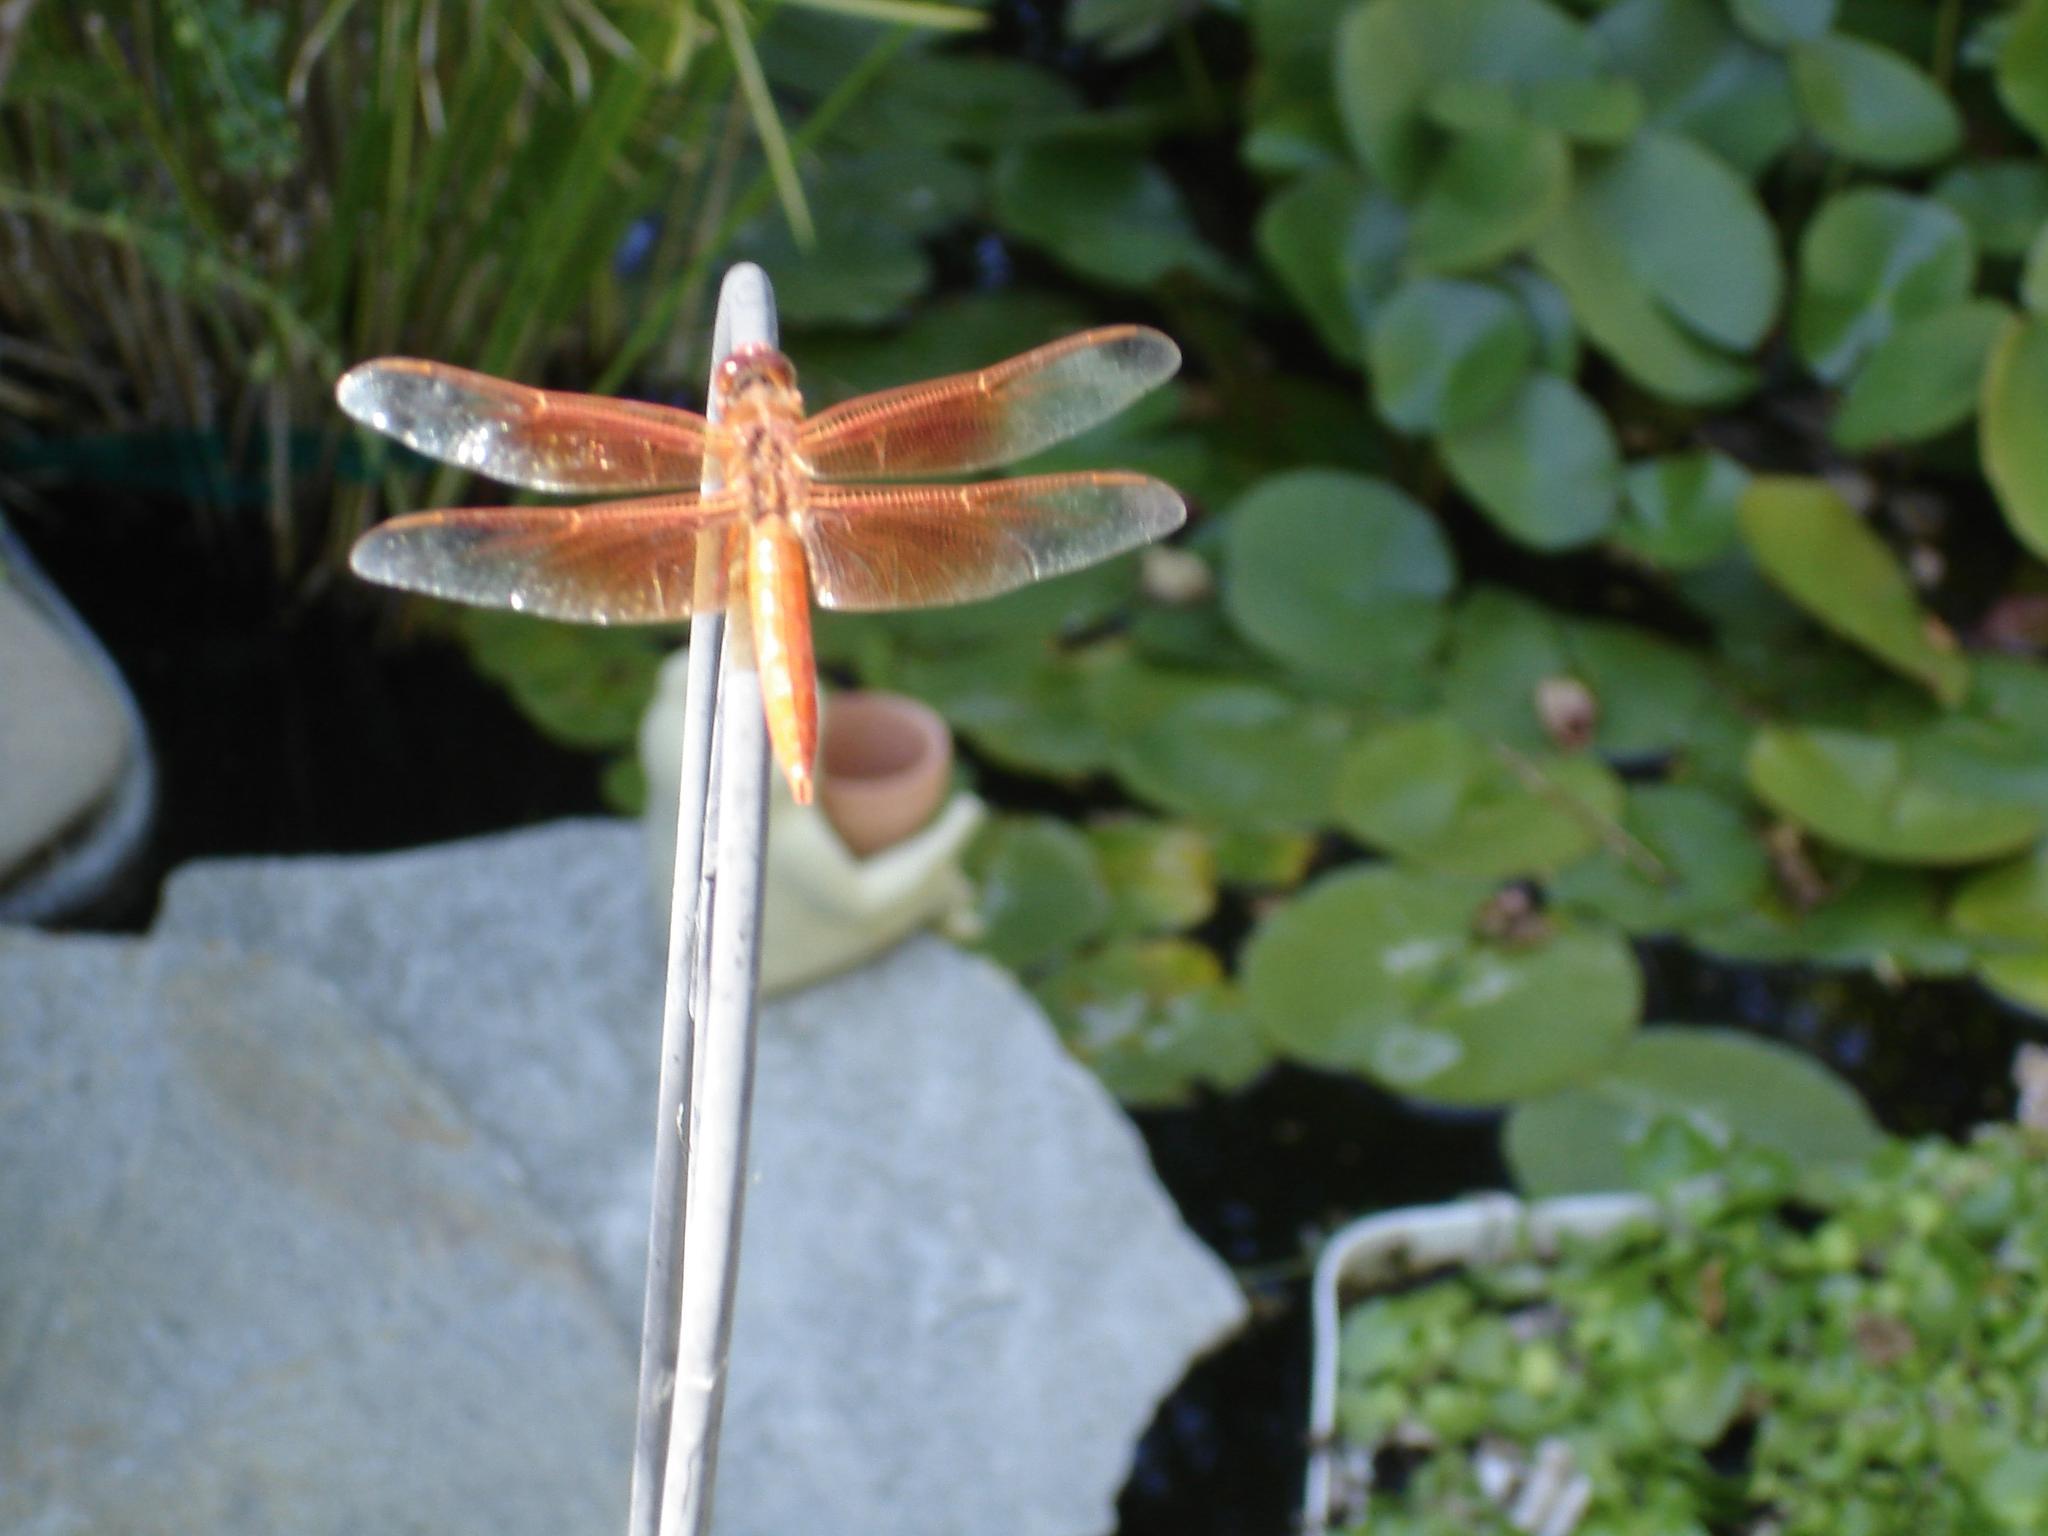 Dragonfly by rboyan88